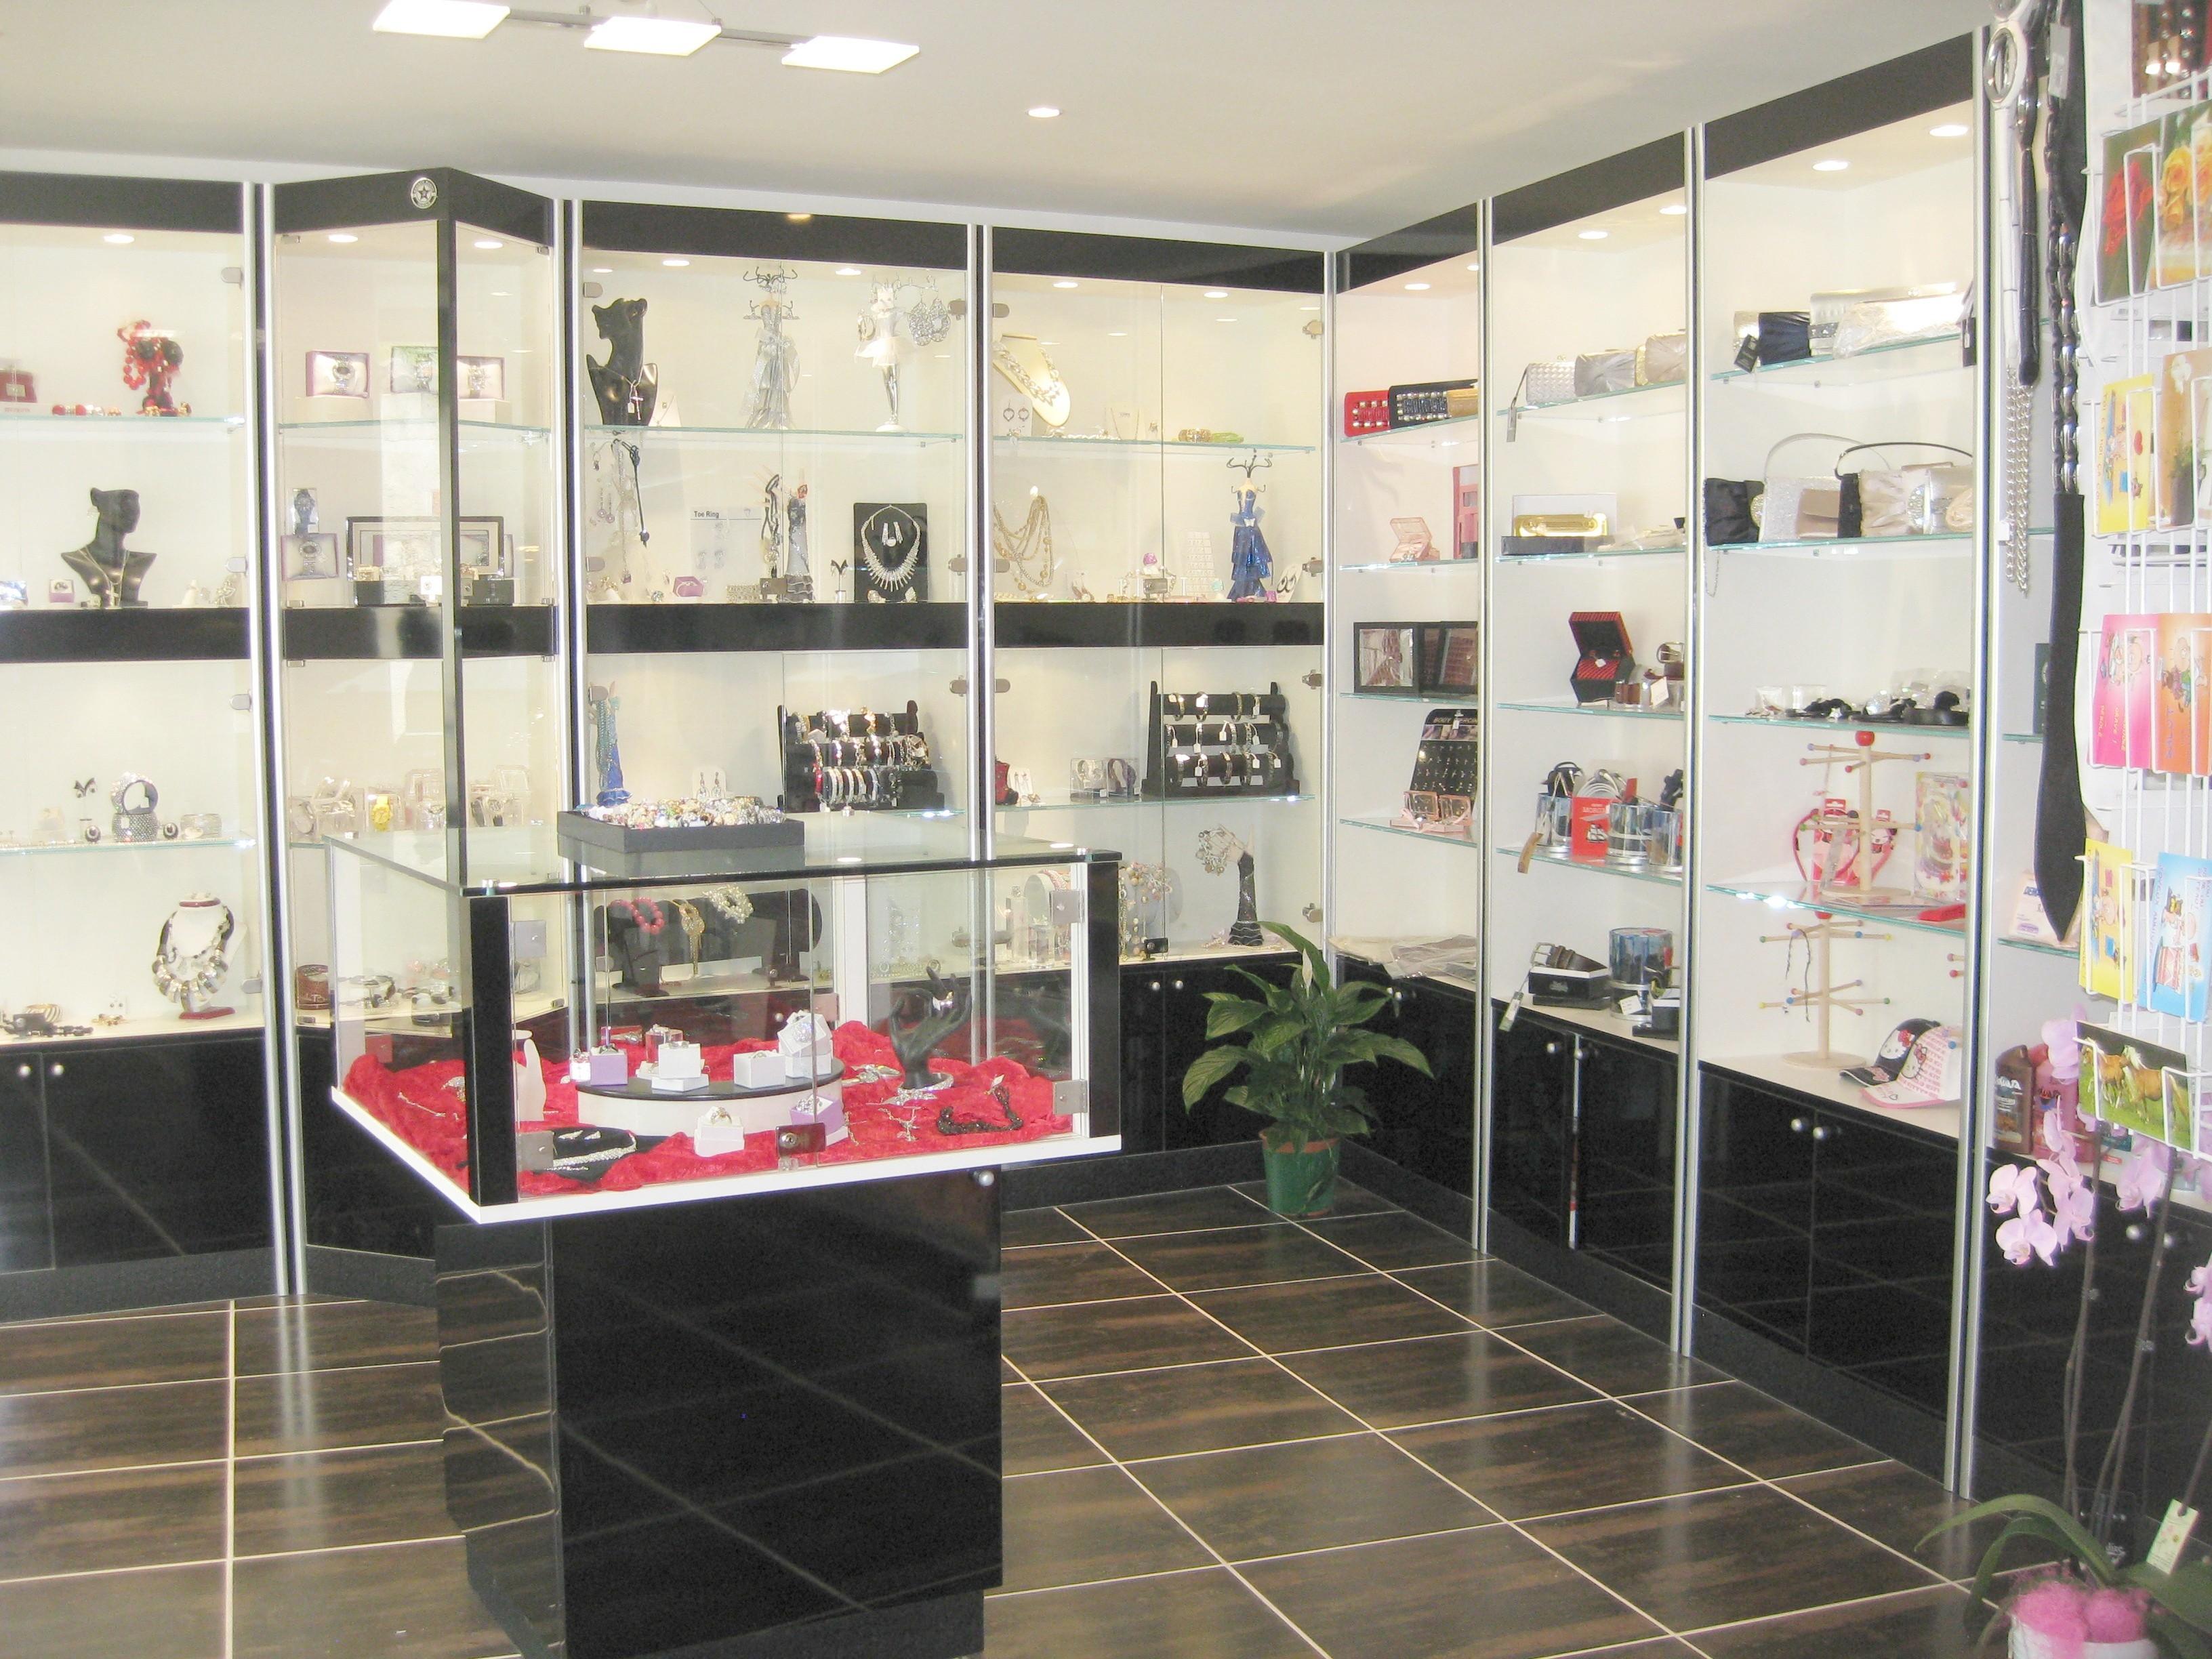 Arredamenti per gioiellerie compra in fabbrica a met for Negozi arredamento vercelli